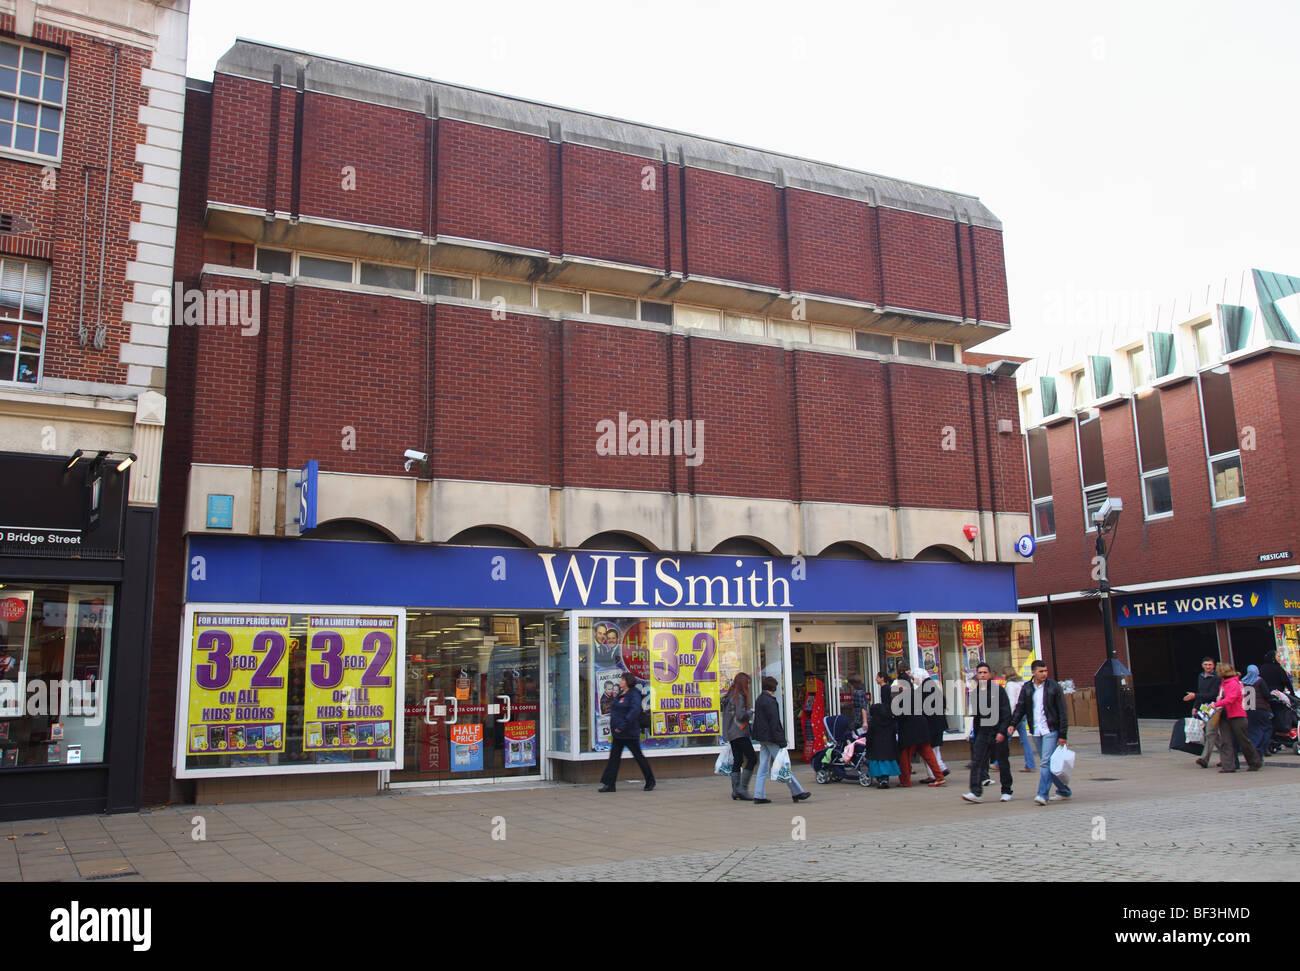 WH Smith shop in Bridge Street, Peterborough, Cambridgeshire - Stock Image